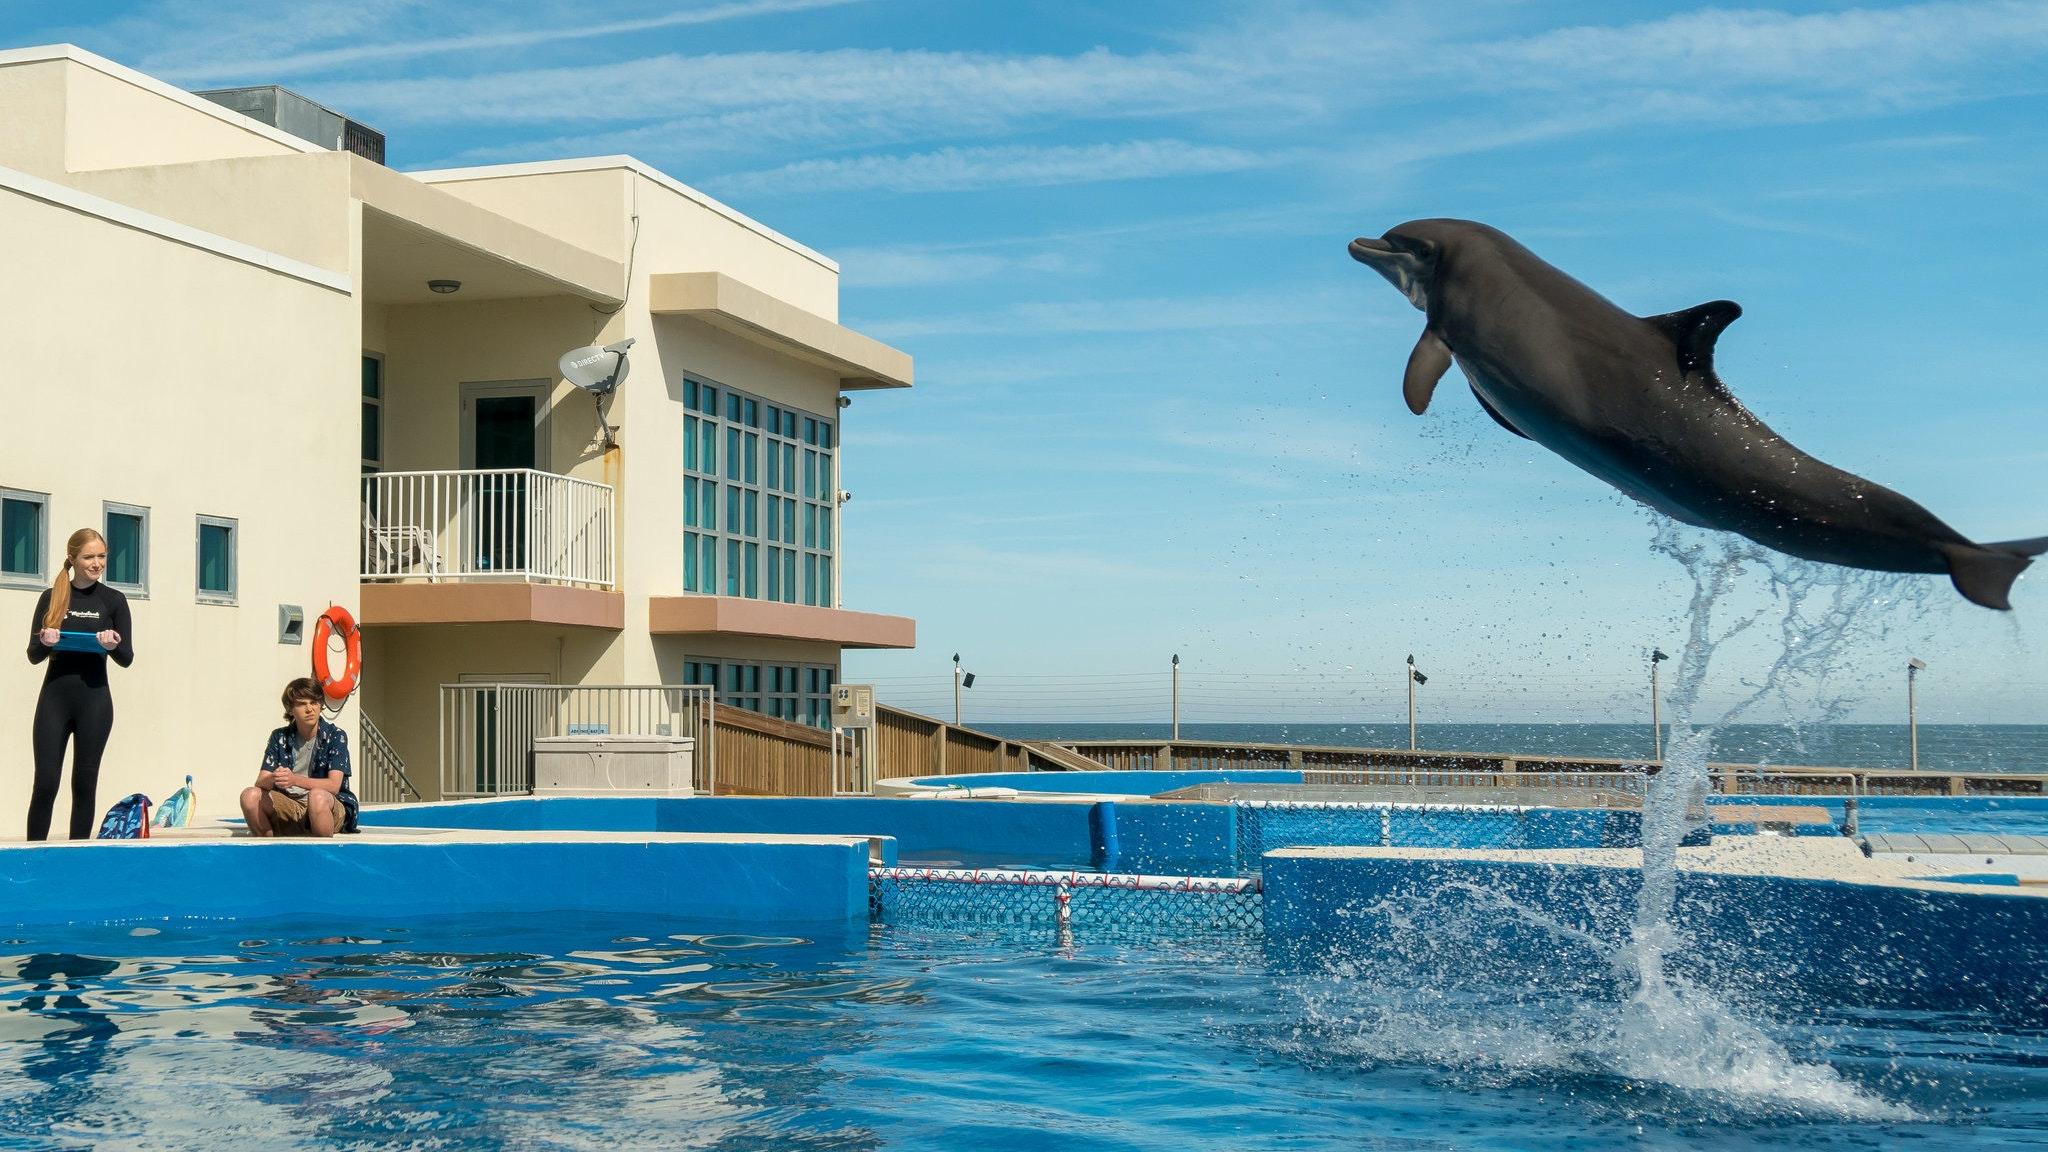 Bernie the Dolphin Soundtrack